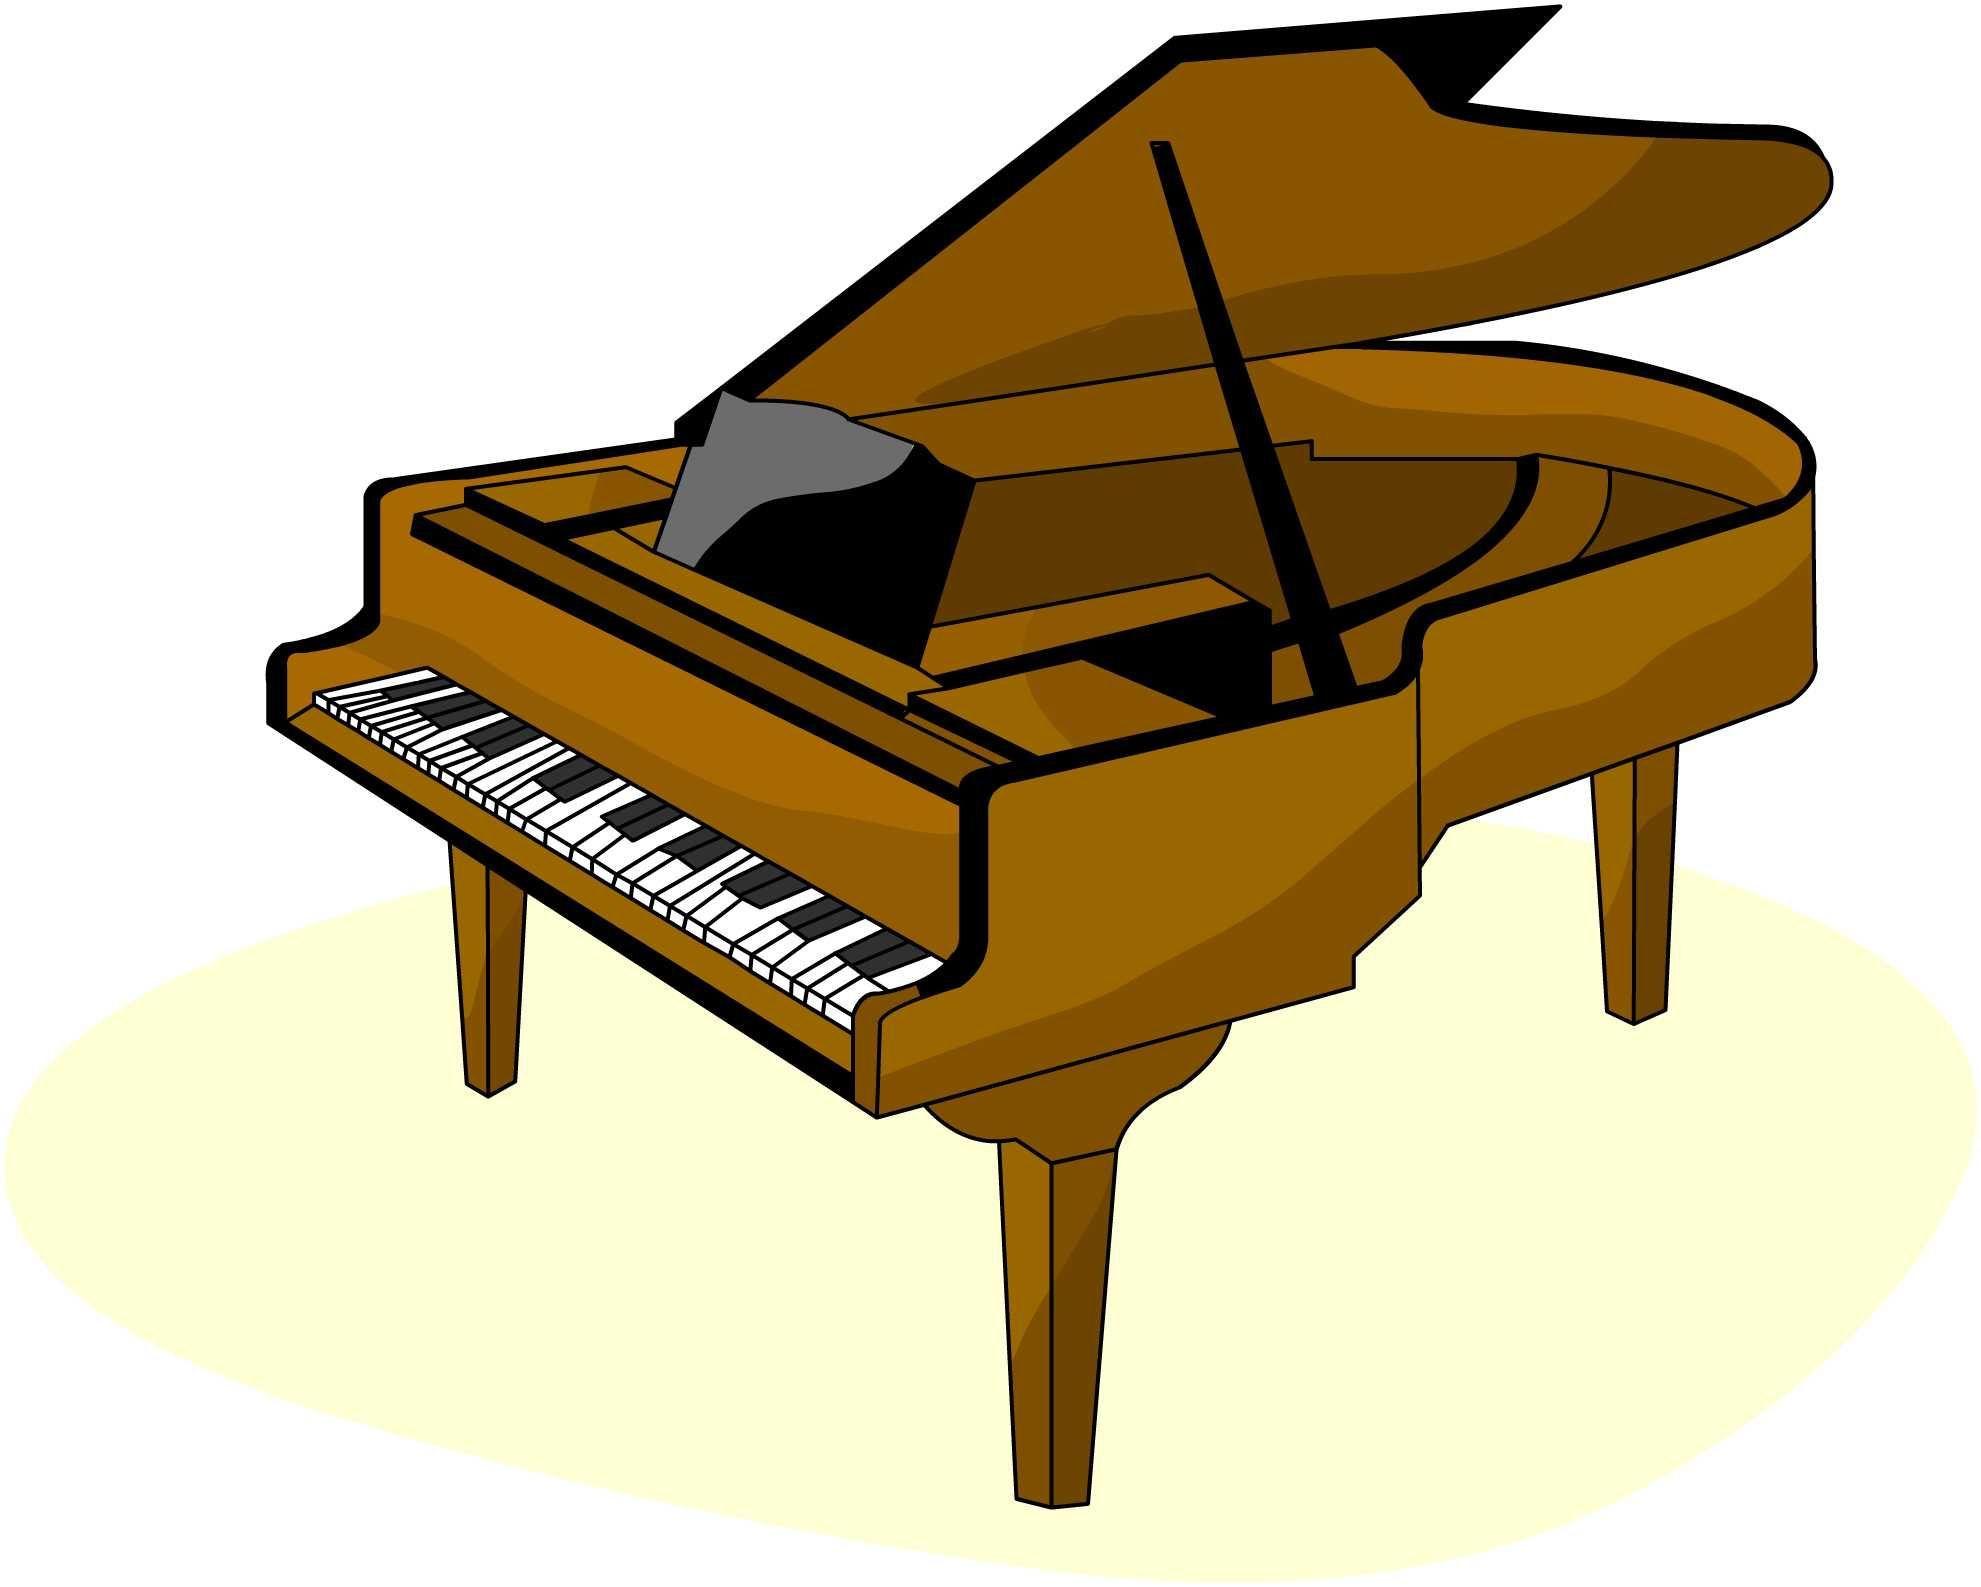 Upright piano clipart clip art royalty free download Piano clip art   piano   Piano art, Music, Music clipart clip art royalty free download